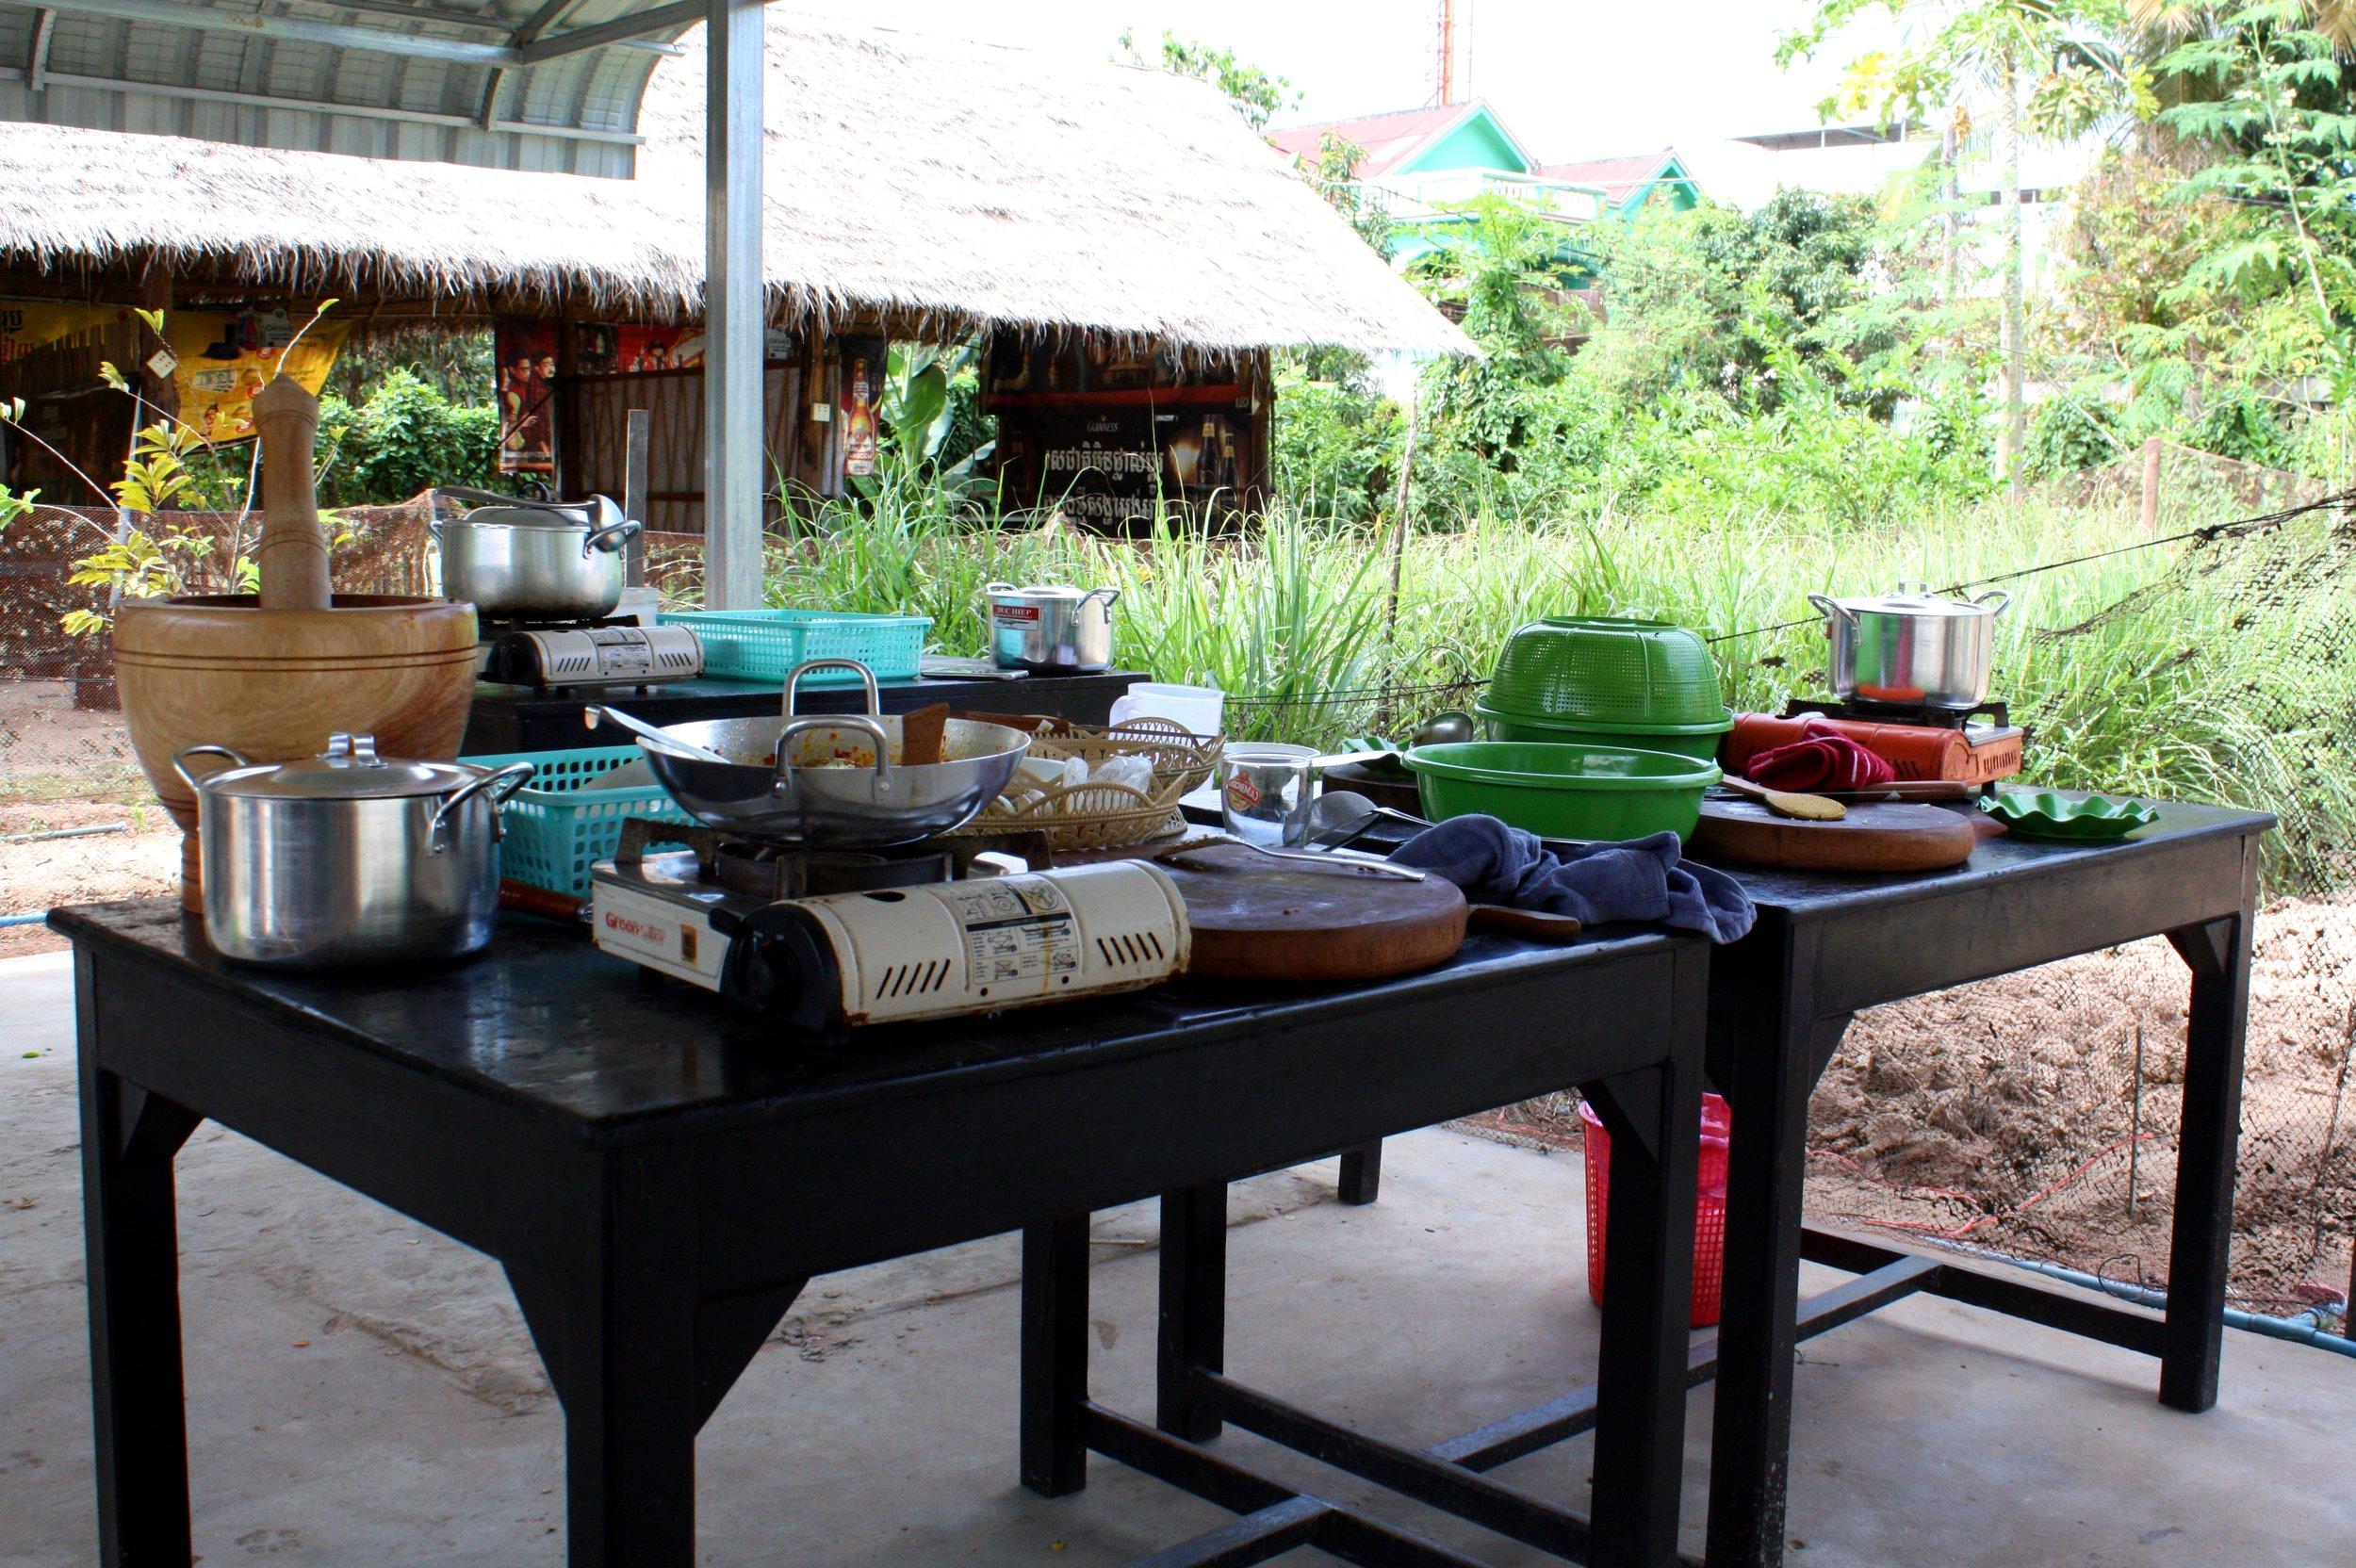 Siem reap cooking